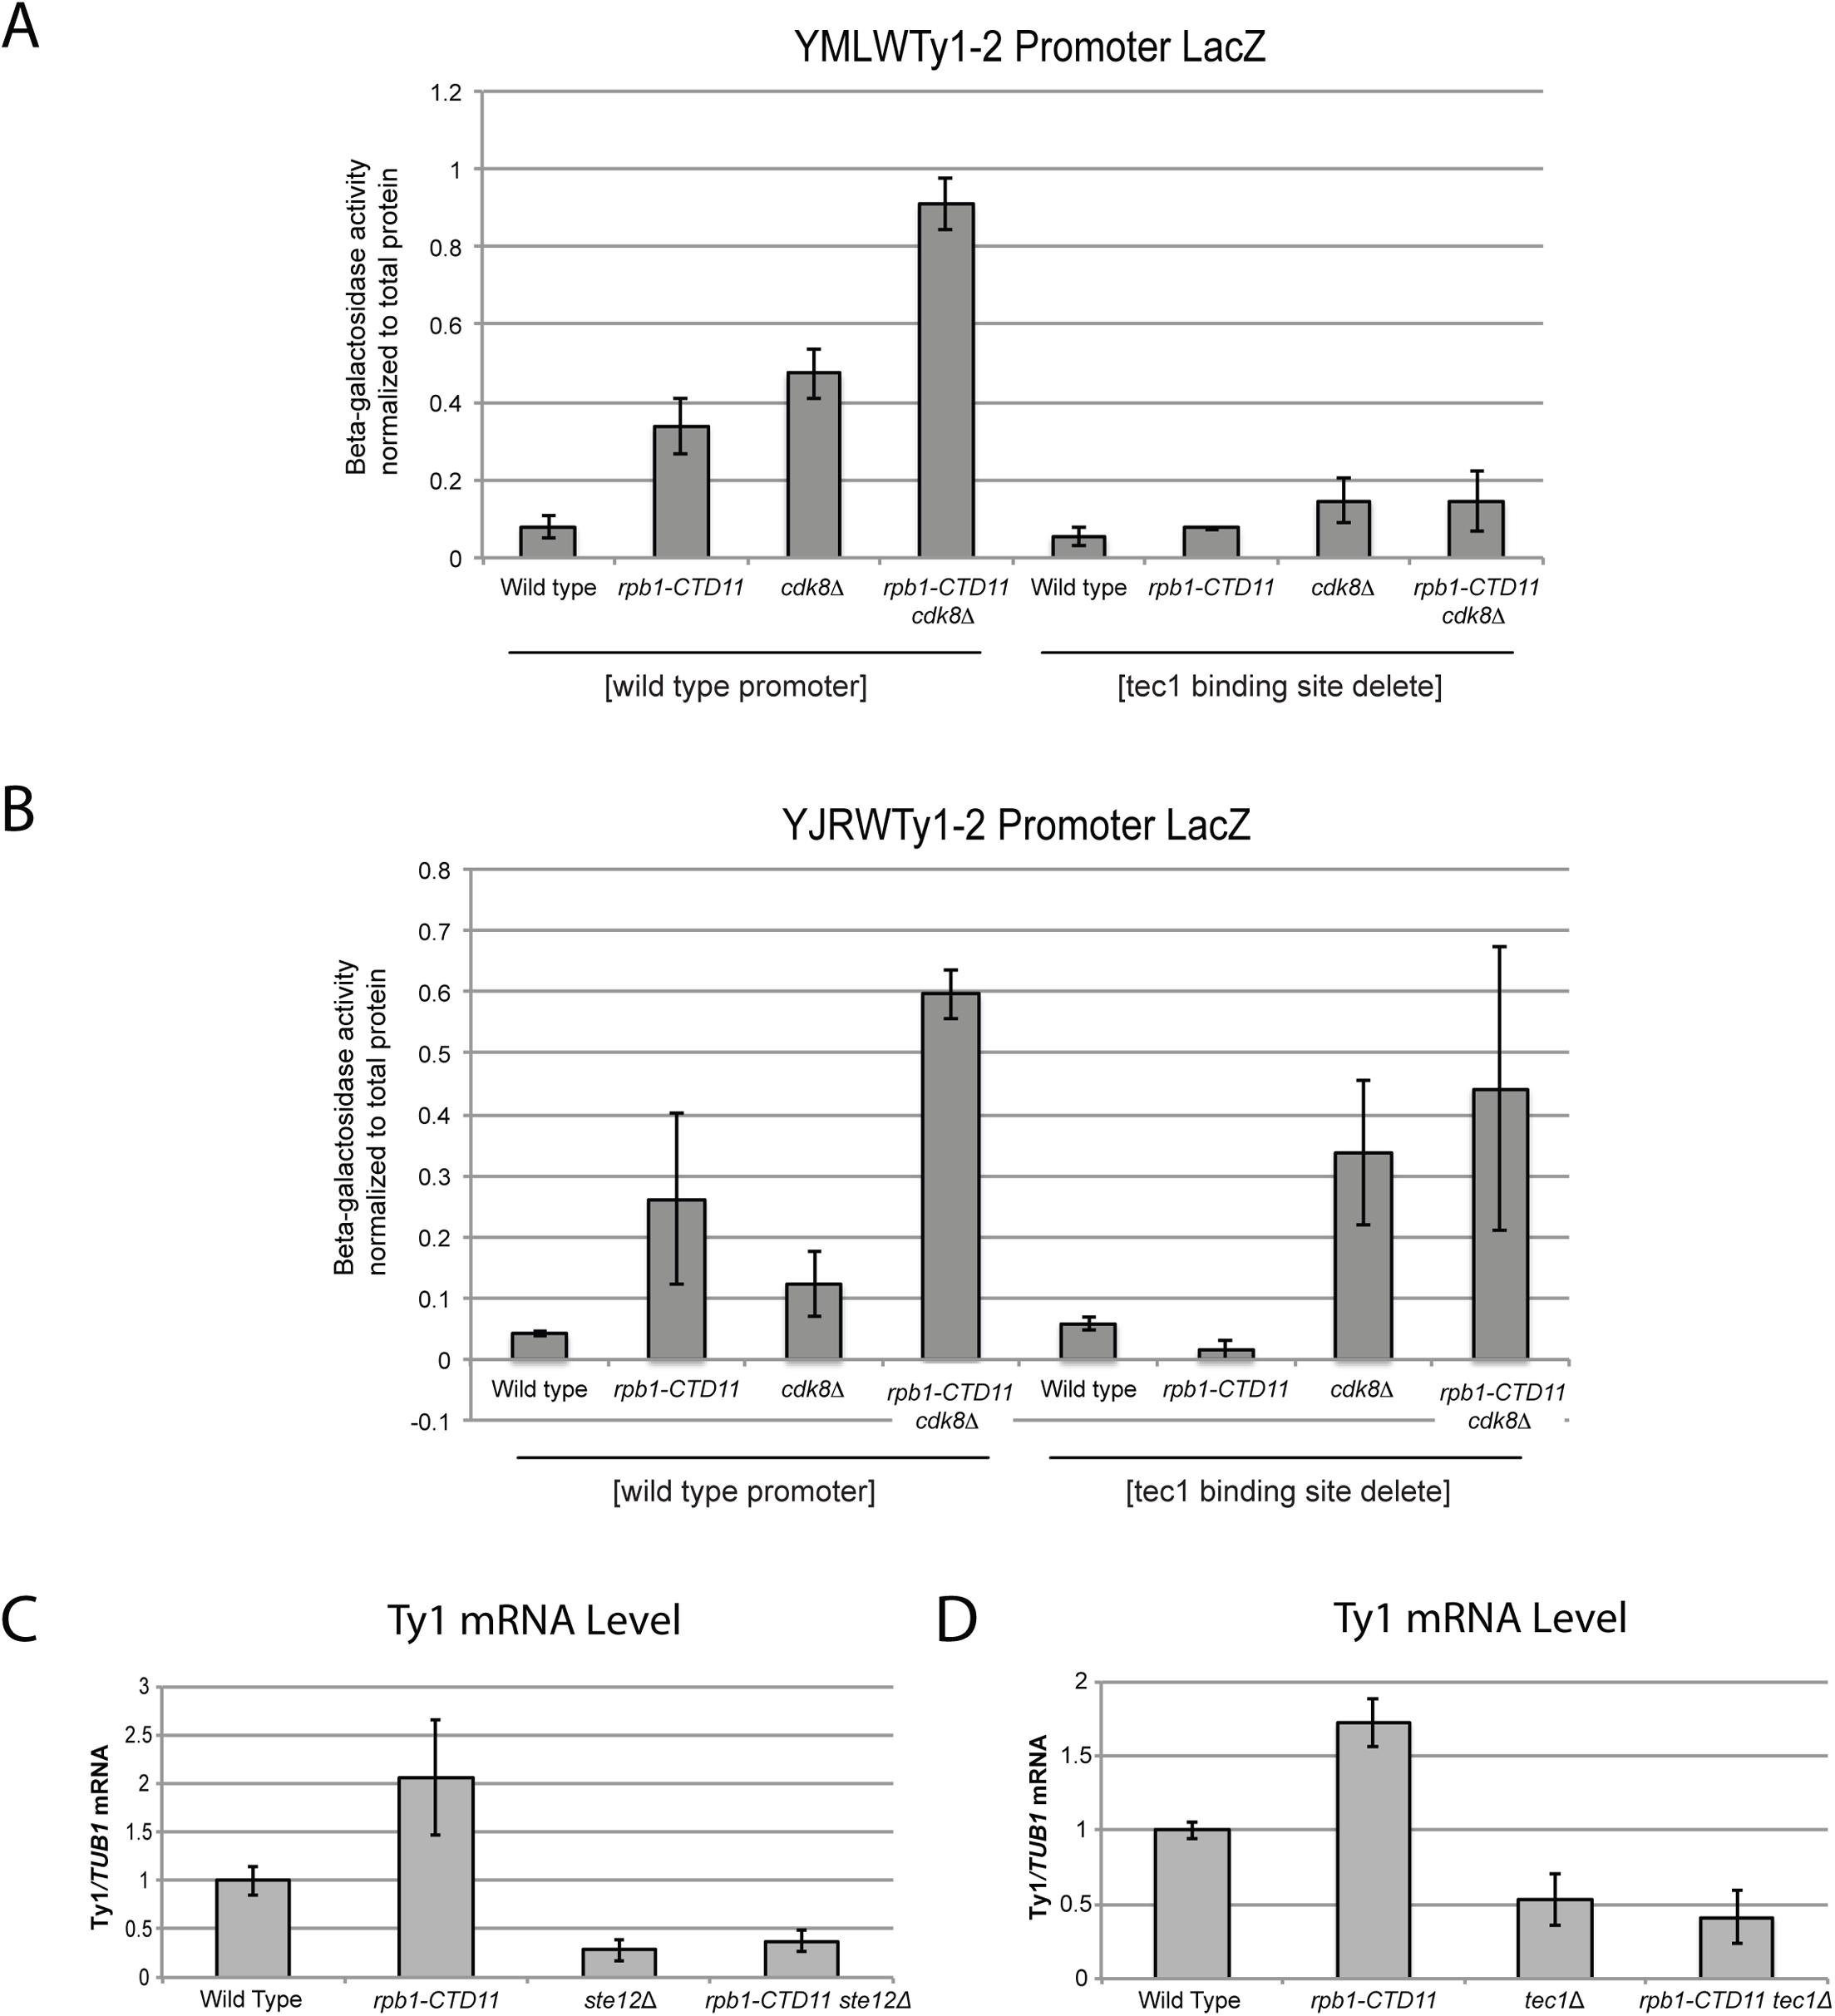 The increased Ty1 gene expression levels observed in the <i>rpb1-CTD11</i> mutant were dependent on <i>TEC1</i> or <i>STE12</i>.